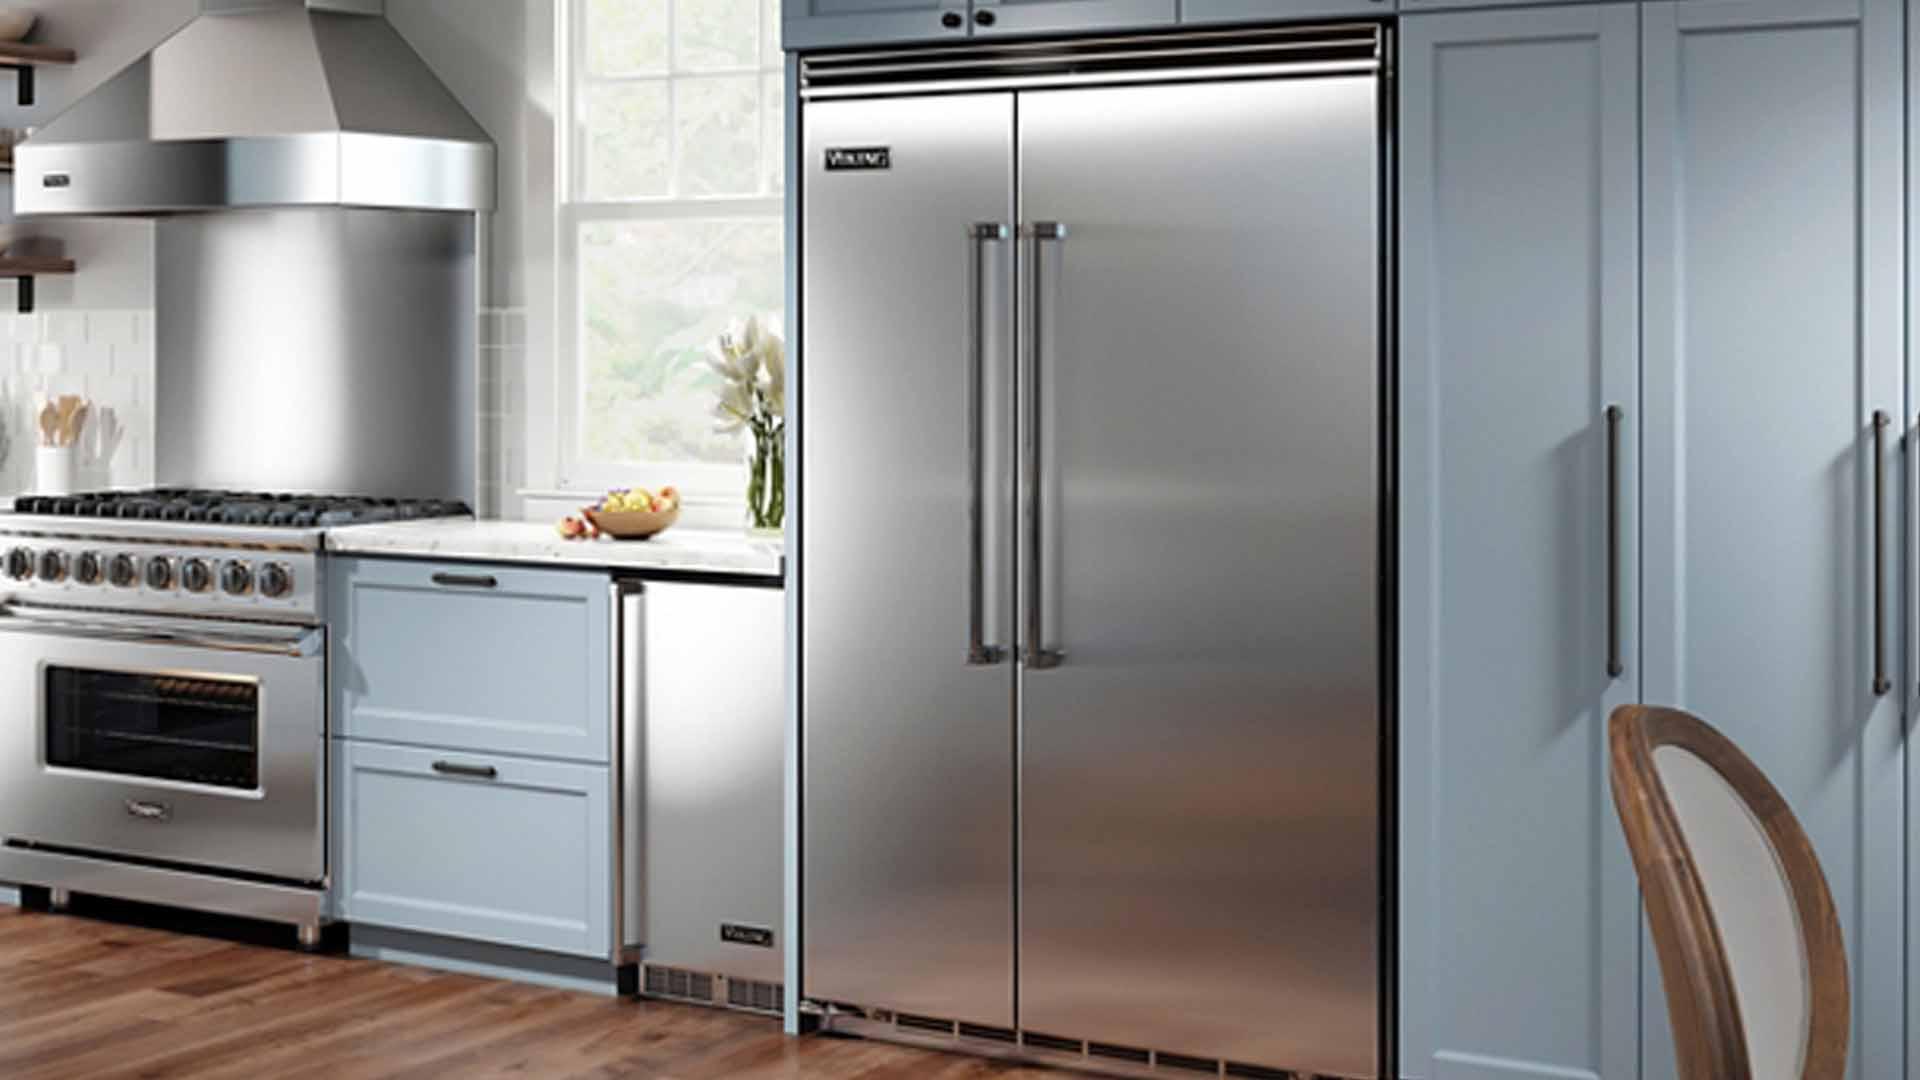 Viking Freestanding Side by Side Refrigerator Repair Service | Viking Appliance Repairs